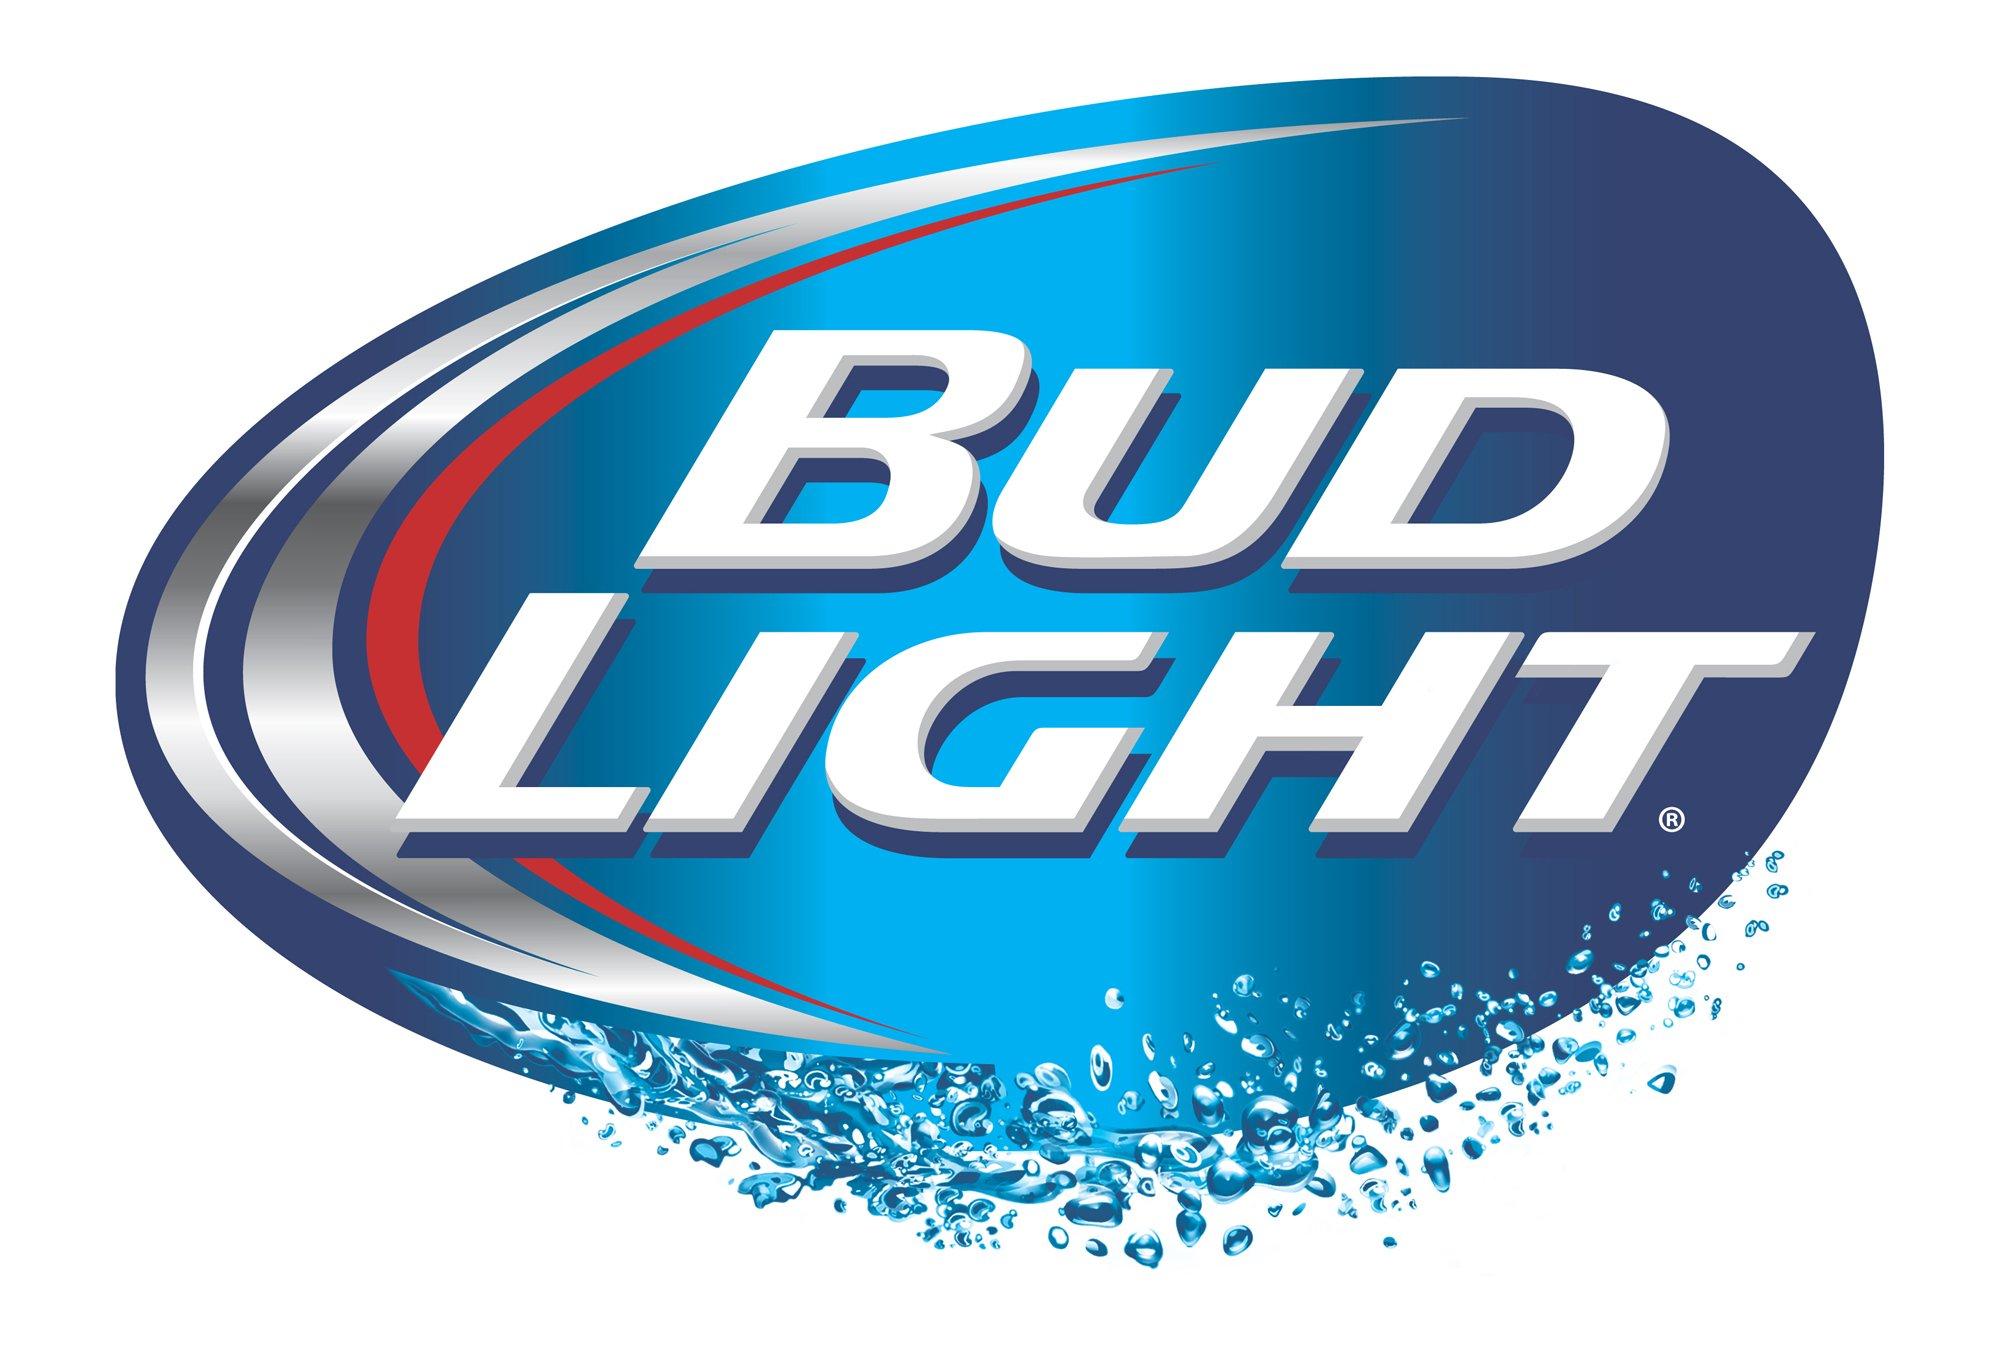 https://secureservercdn.net/50.62.90.29/pgj.7f5.myftpupload.com/wp-content/uploads/2021/07/Bud-Light-Birmingham.jpg?time=1634480124